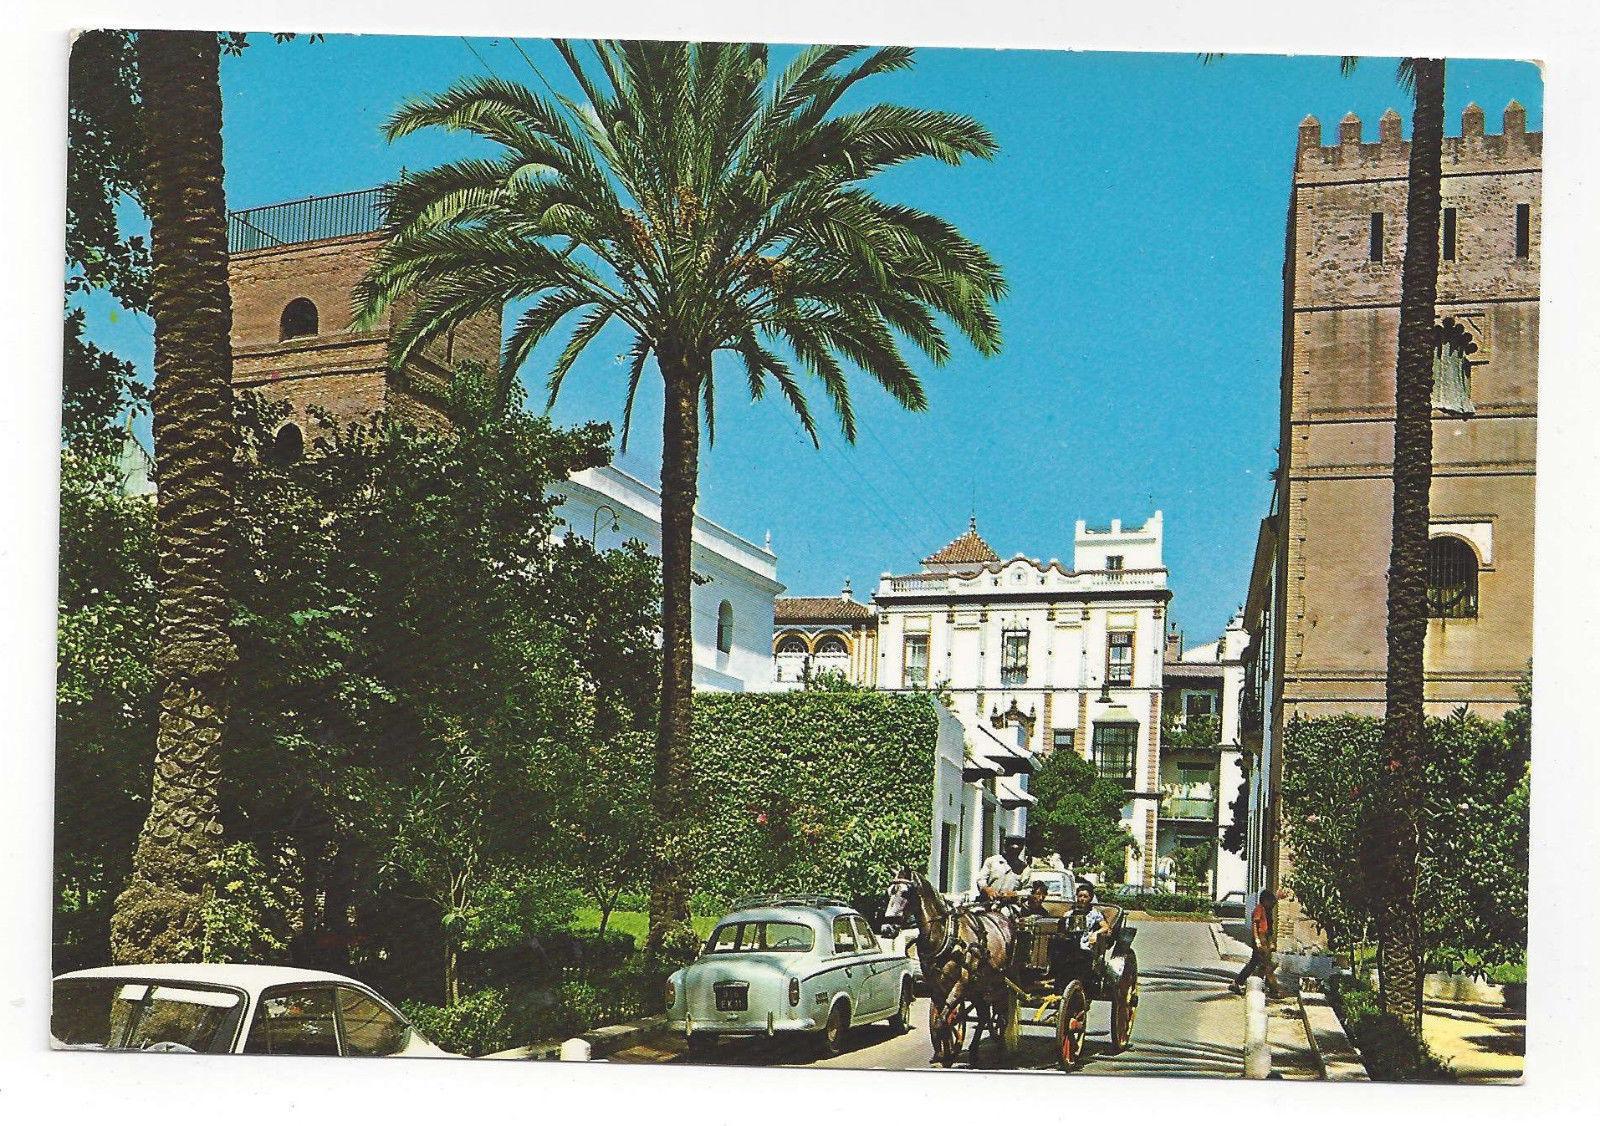 Spain Sevilla Santa Cruz Quarter Horse Drawn Cab Vtg Postcard 4X6 Seville